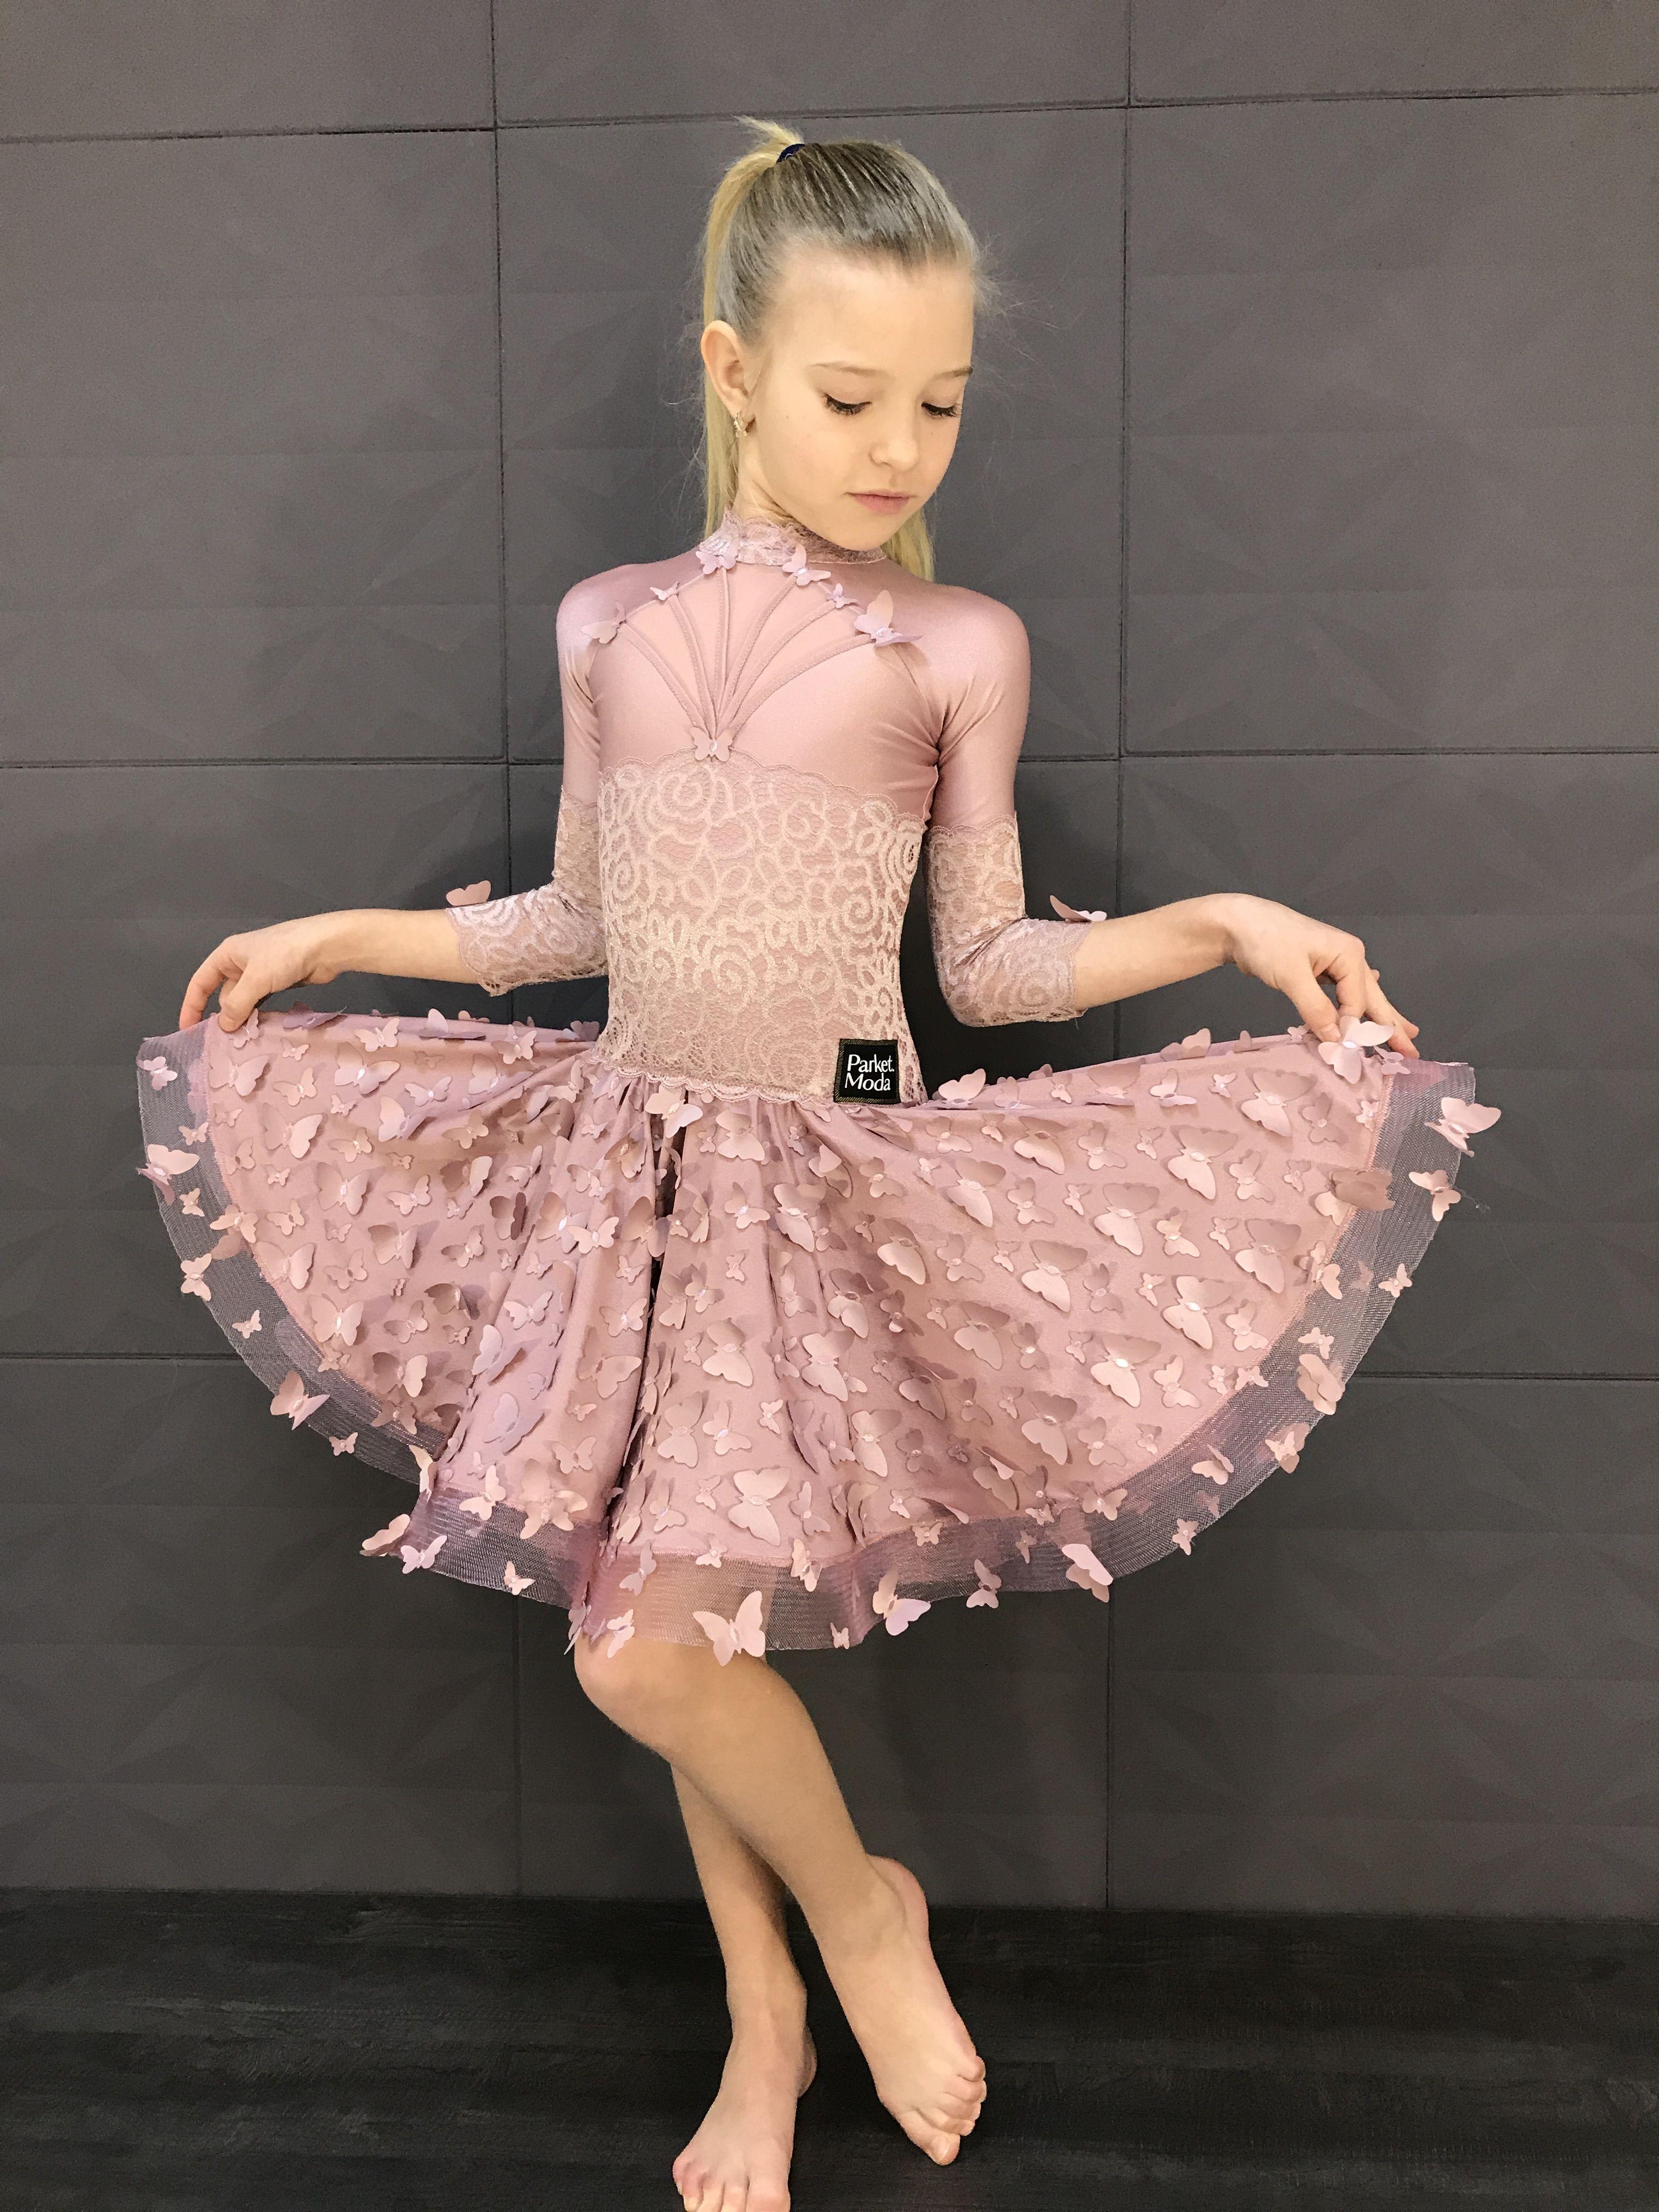 Pin de Paulette Crawford en Ballroom - Junior / Juvenile | Pinterest ...